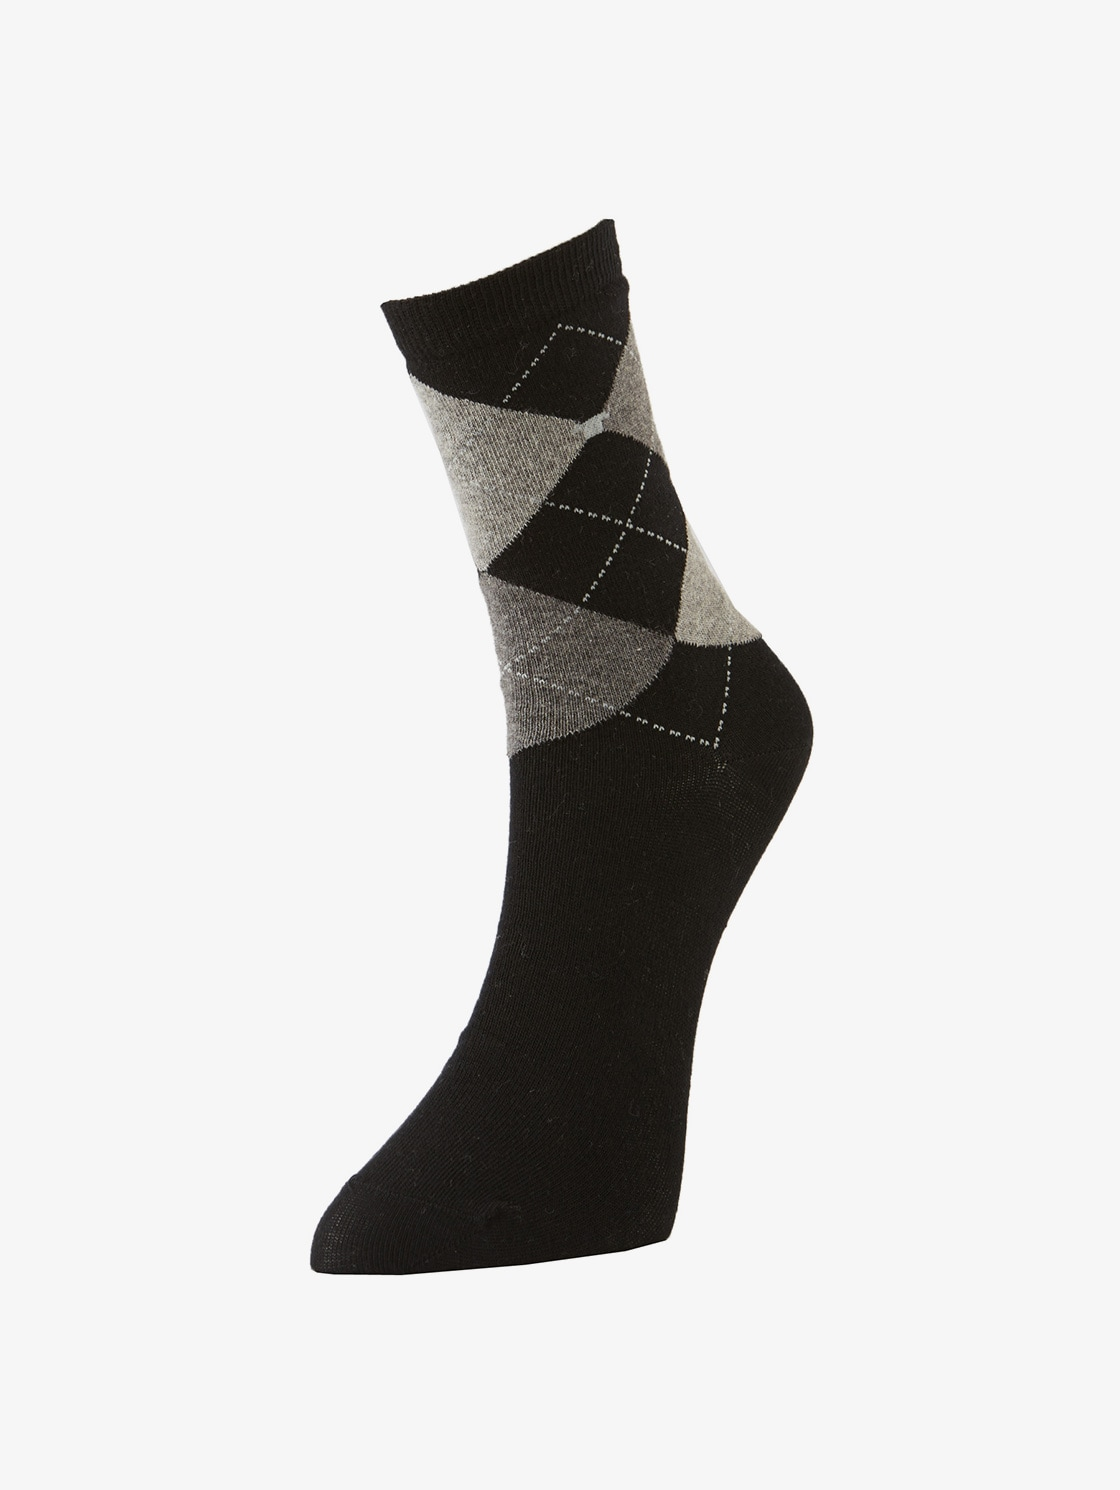 Tom Tailor Casual Socken im Doppelpack, Damen, black, Größe: 35 38